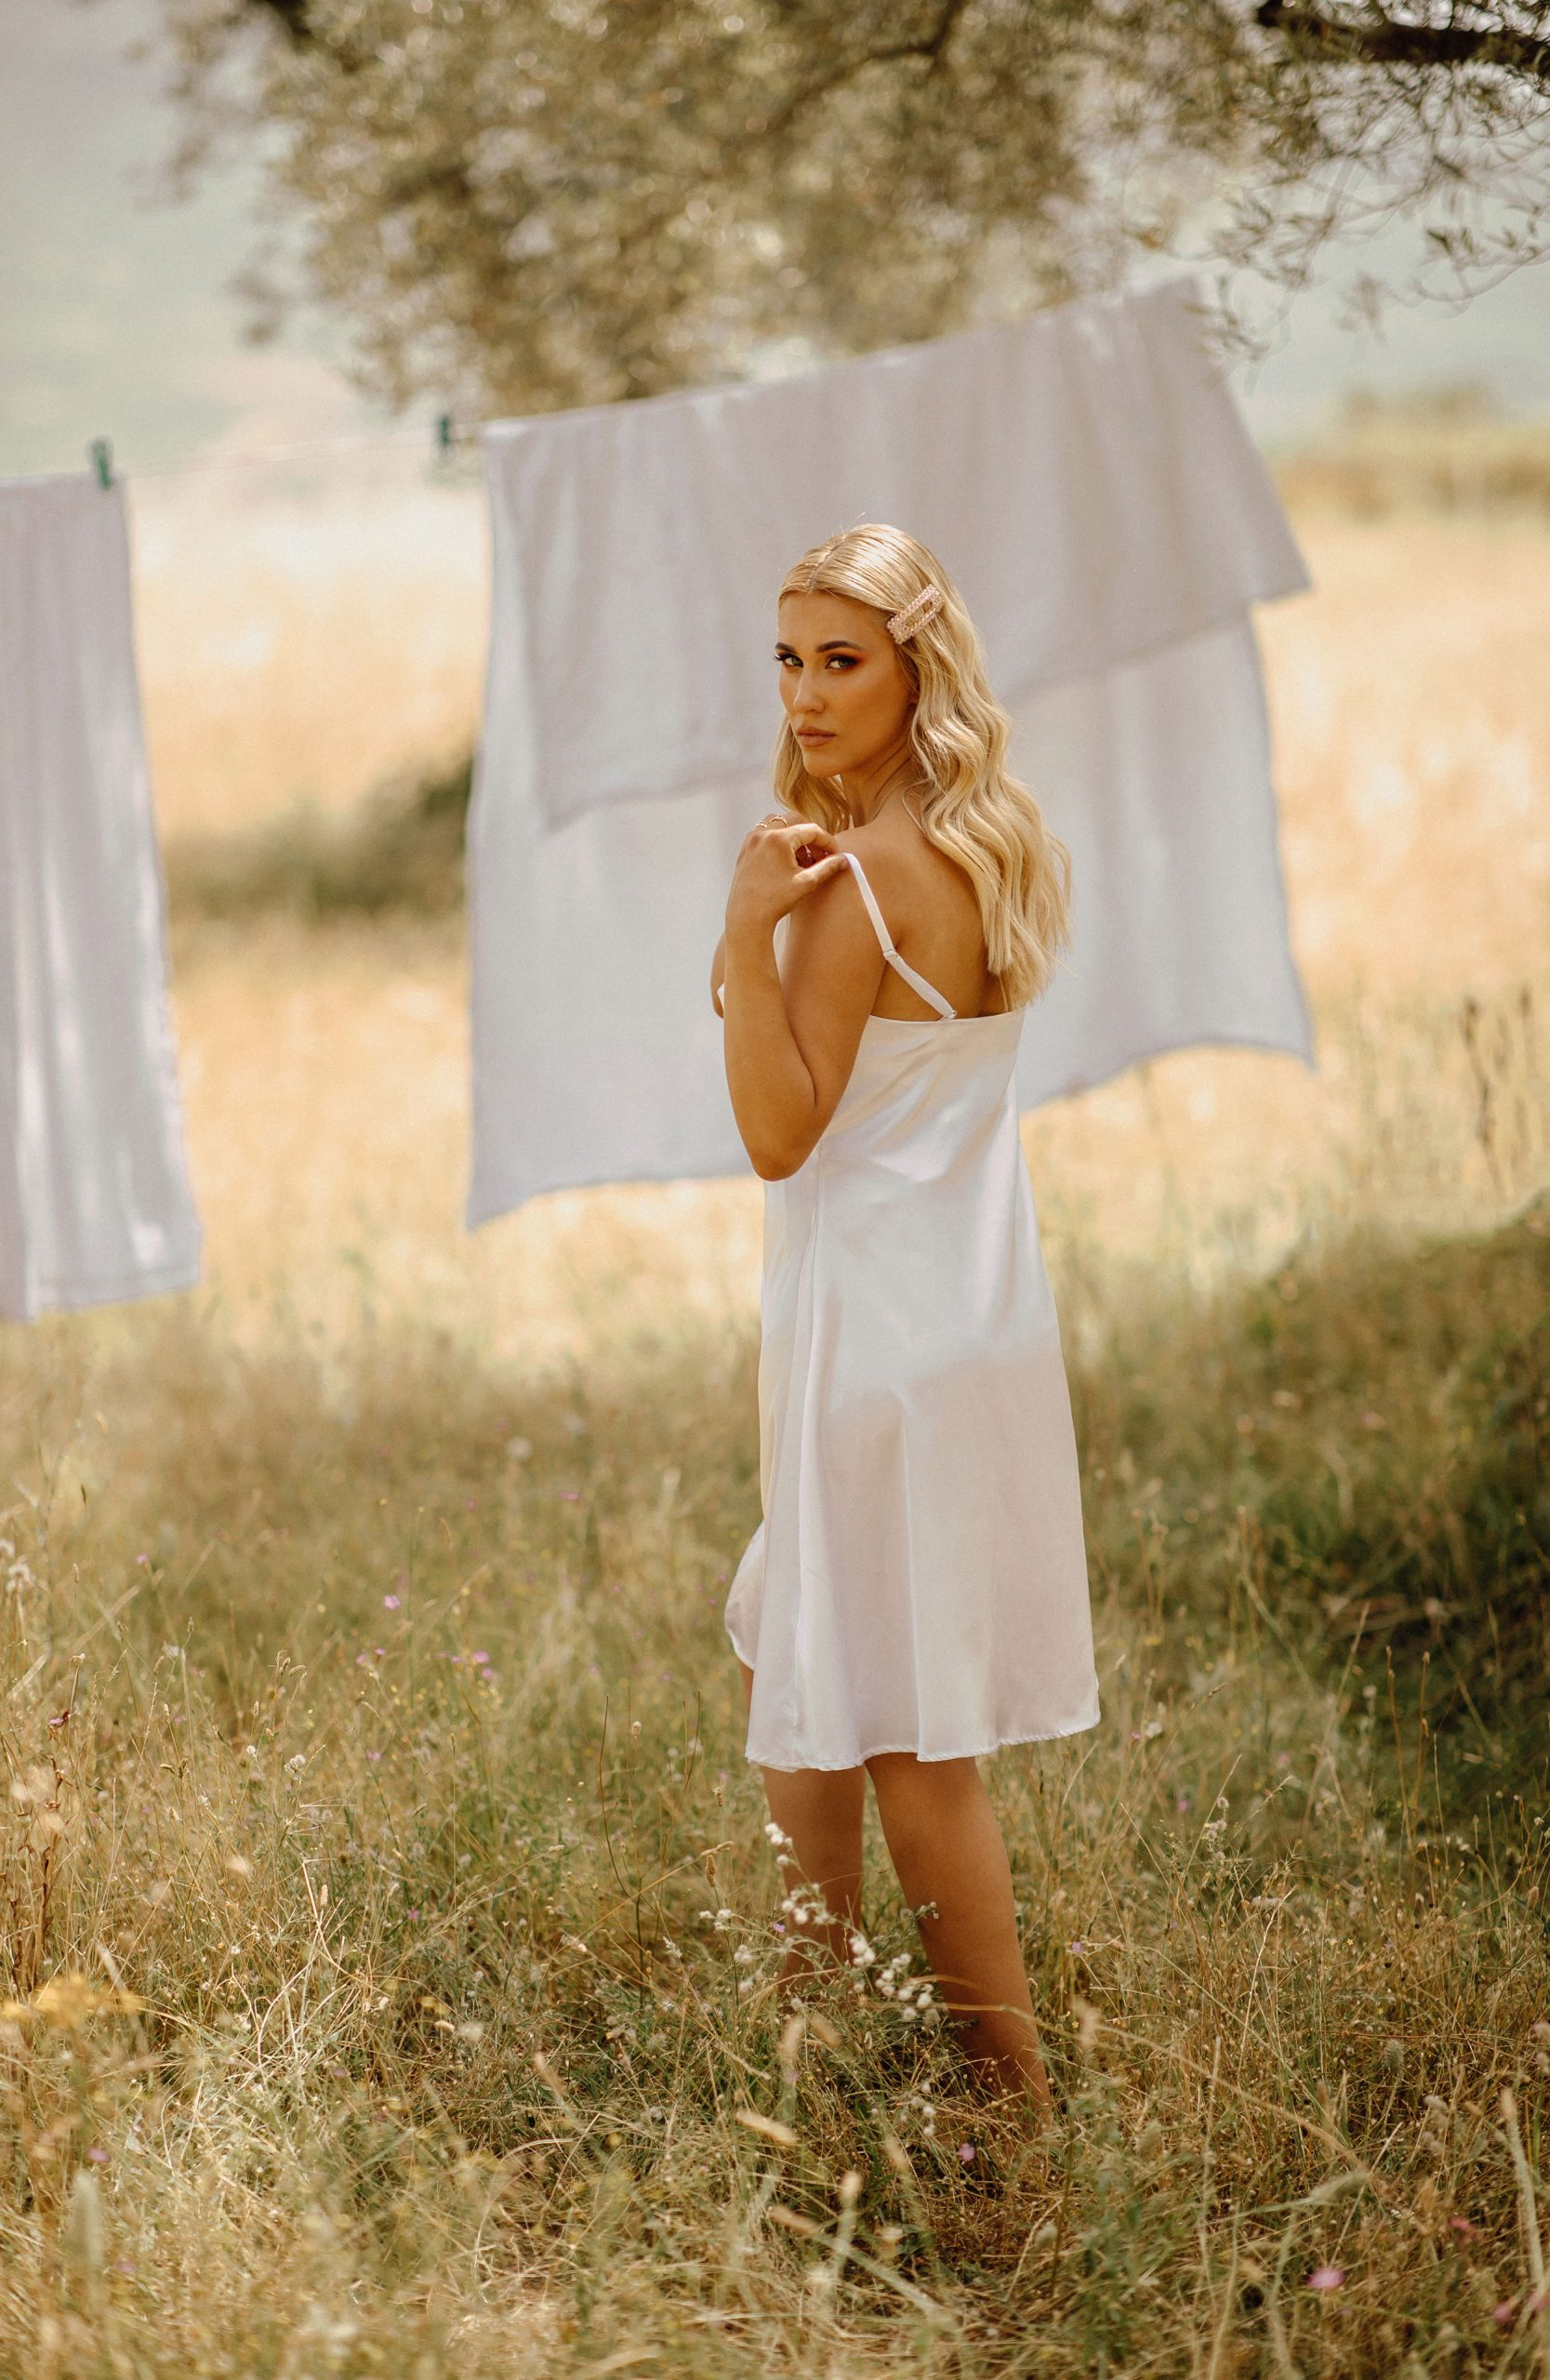 Beautiful posing near a clothesline